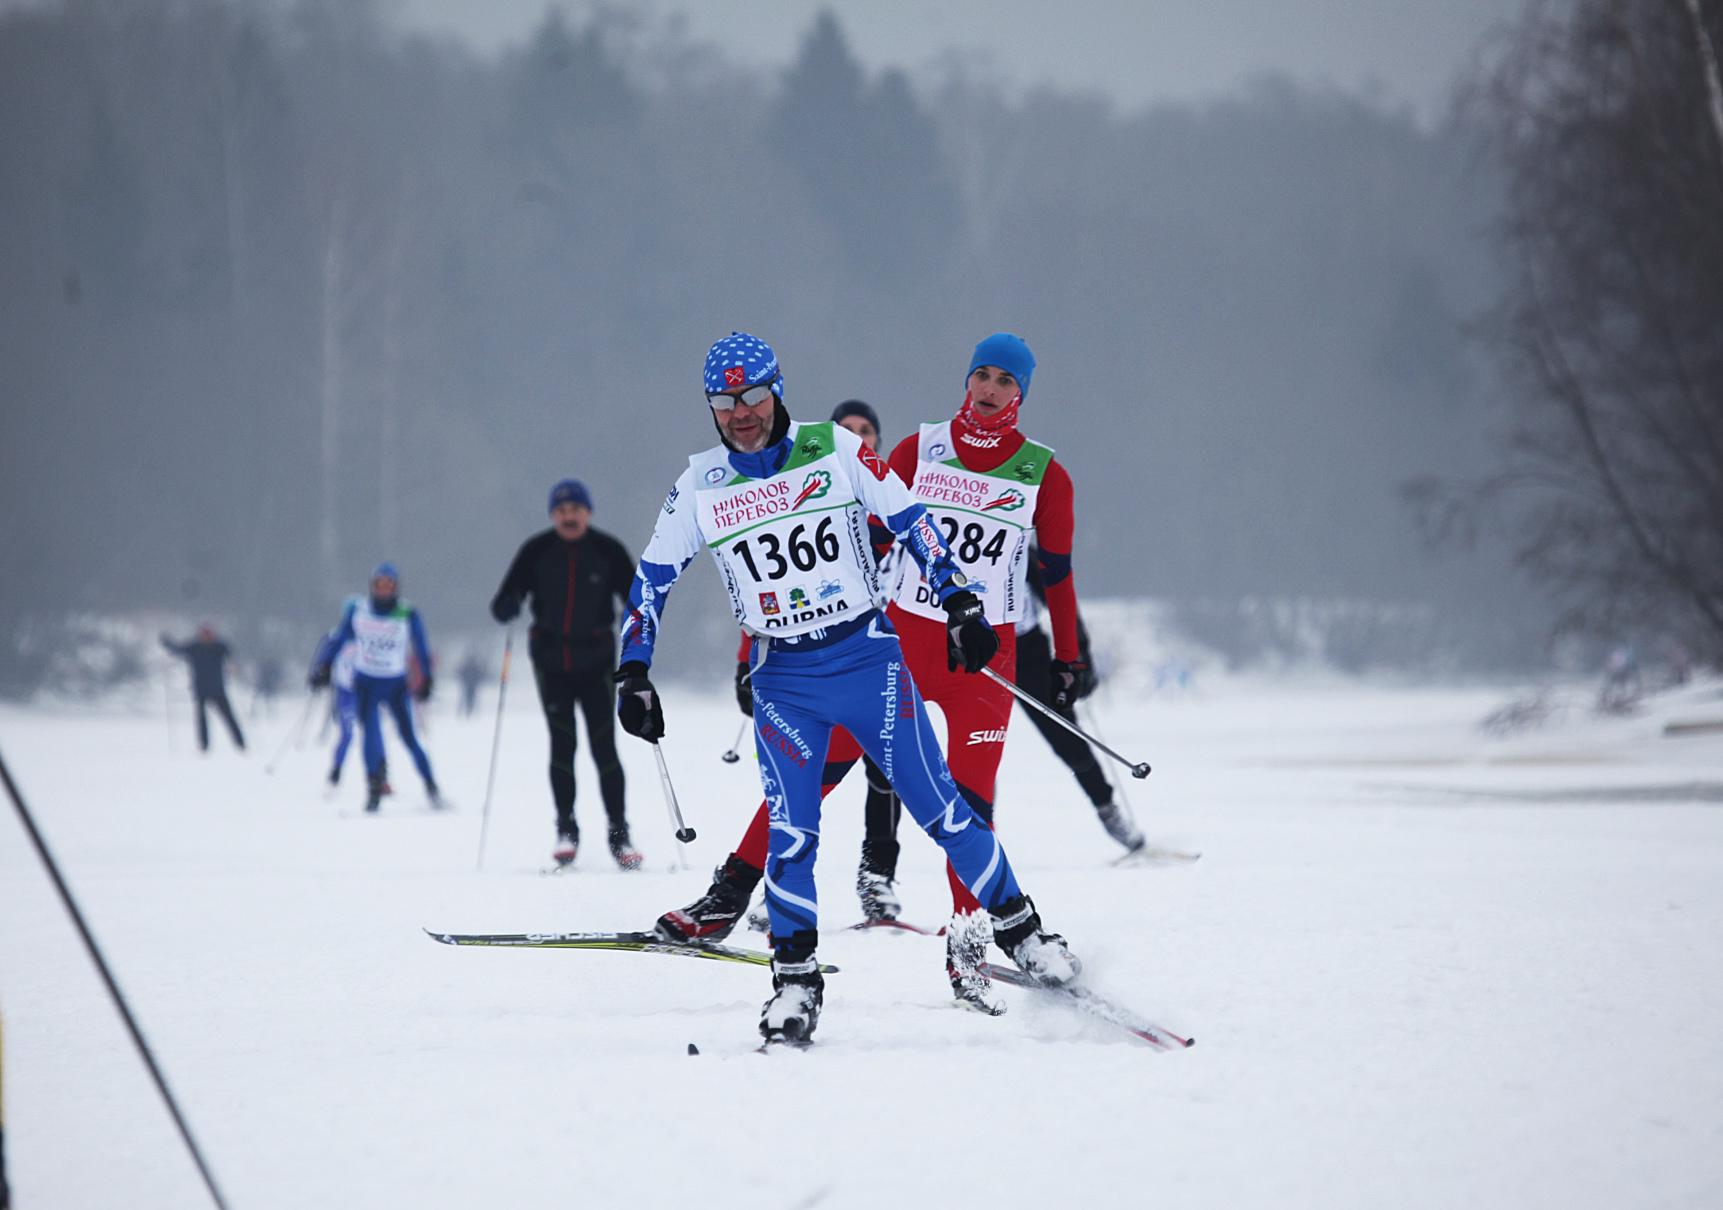 Андрей Чепакин. Фото: из архива Russialoppet